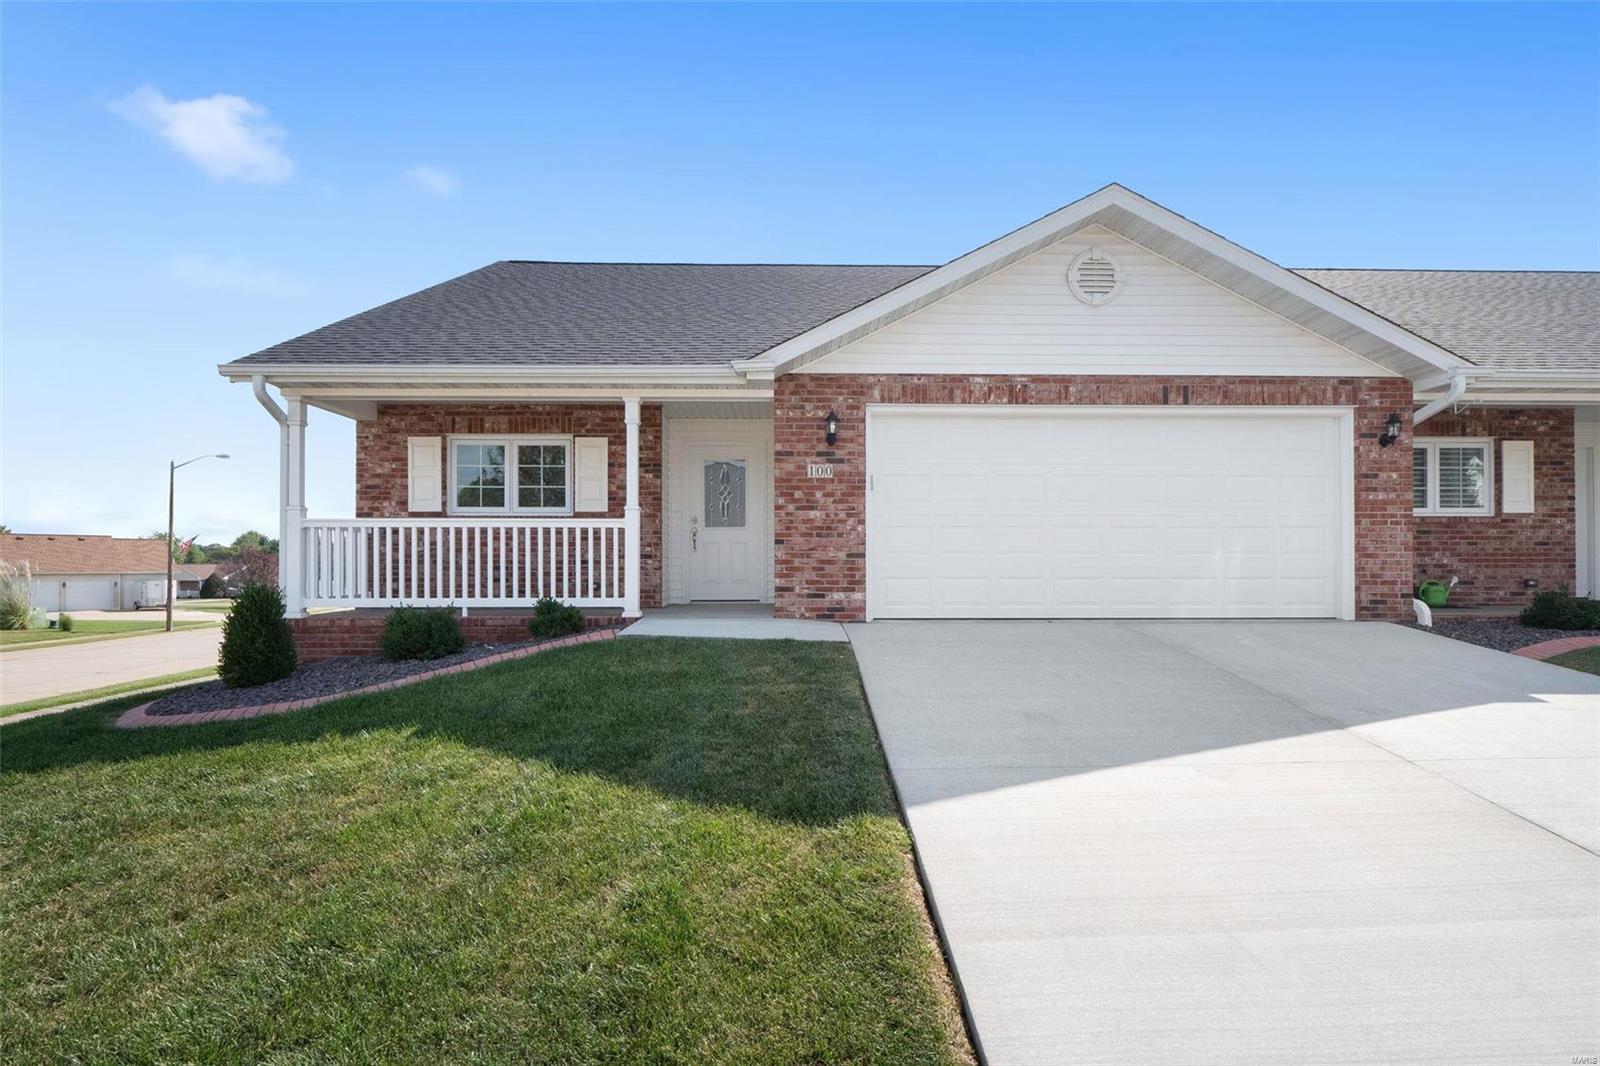 100 Megan Court Property Photo - Valmeyer, IL real estate listing